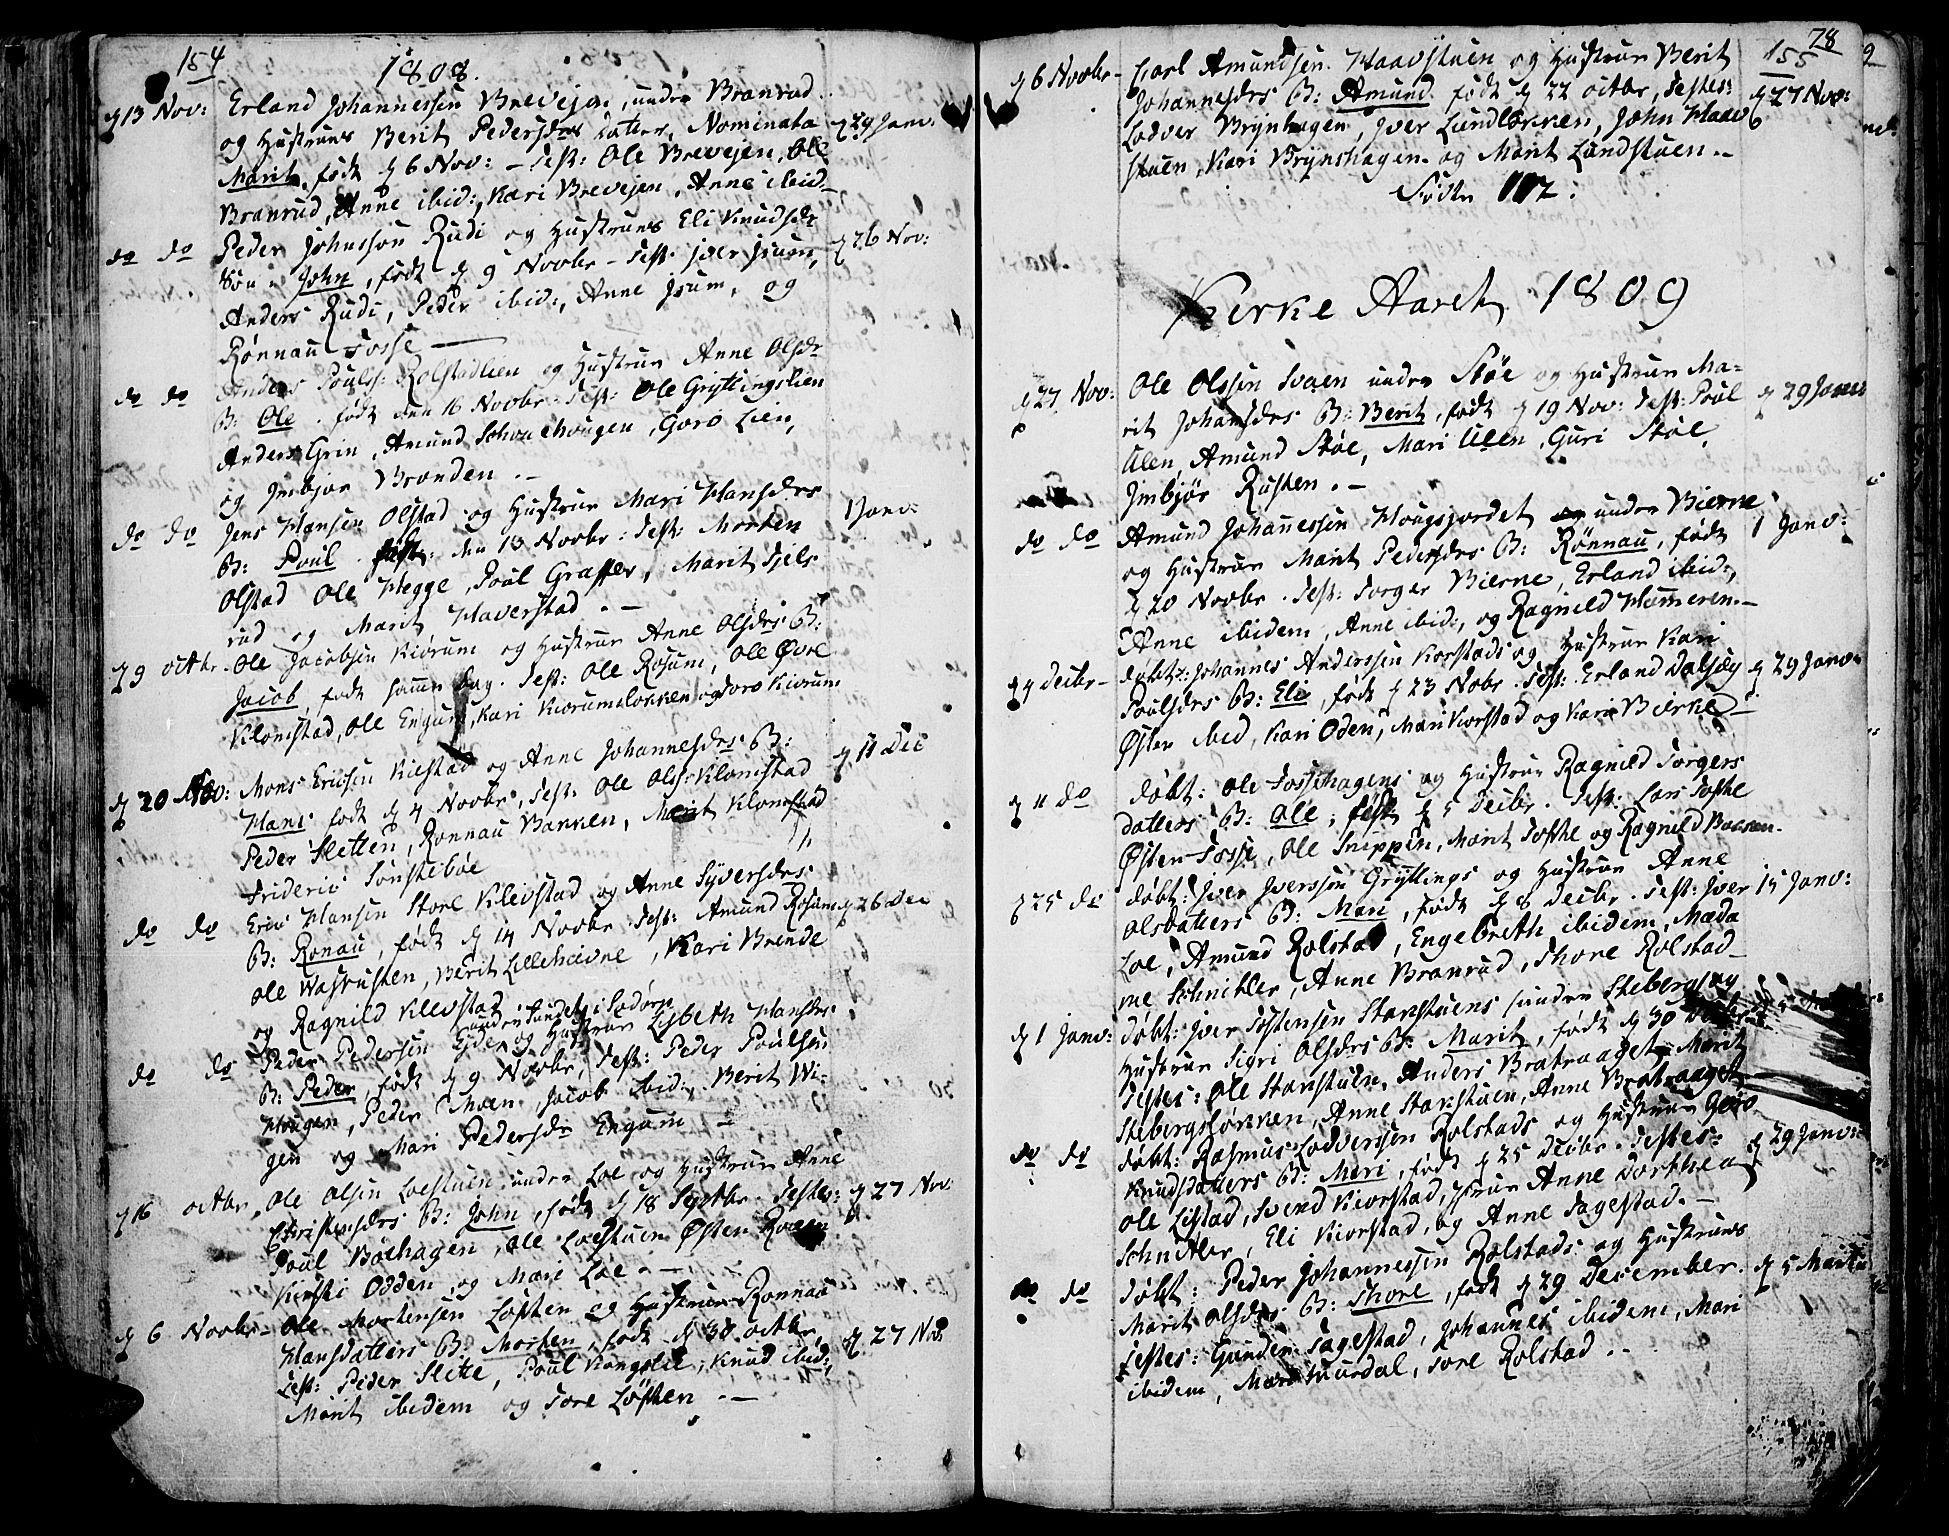 SAH, Fron prestekontor, H/Ha/Haa/L0001: Ministerialbok nr. 1, 1799-1816, s. 154-155